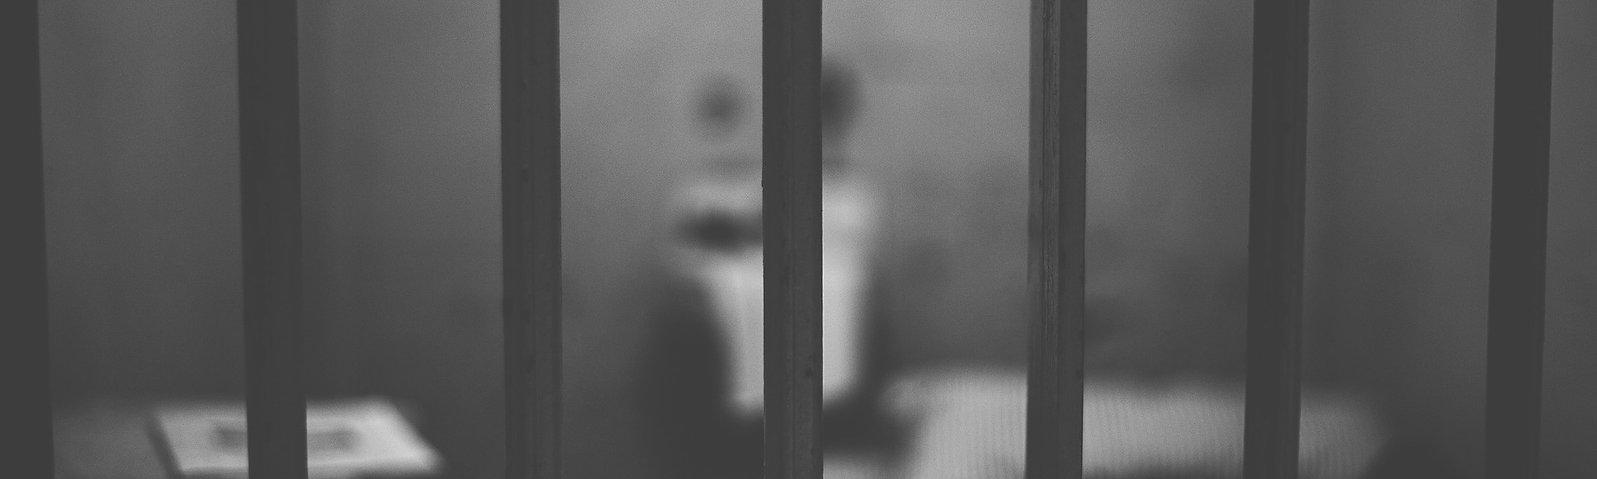 prison-553836_1920_edited.jpg